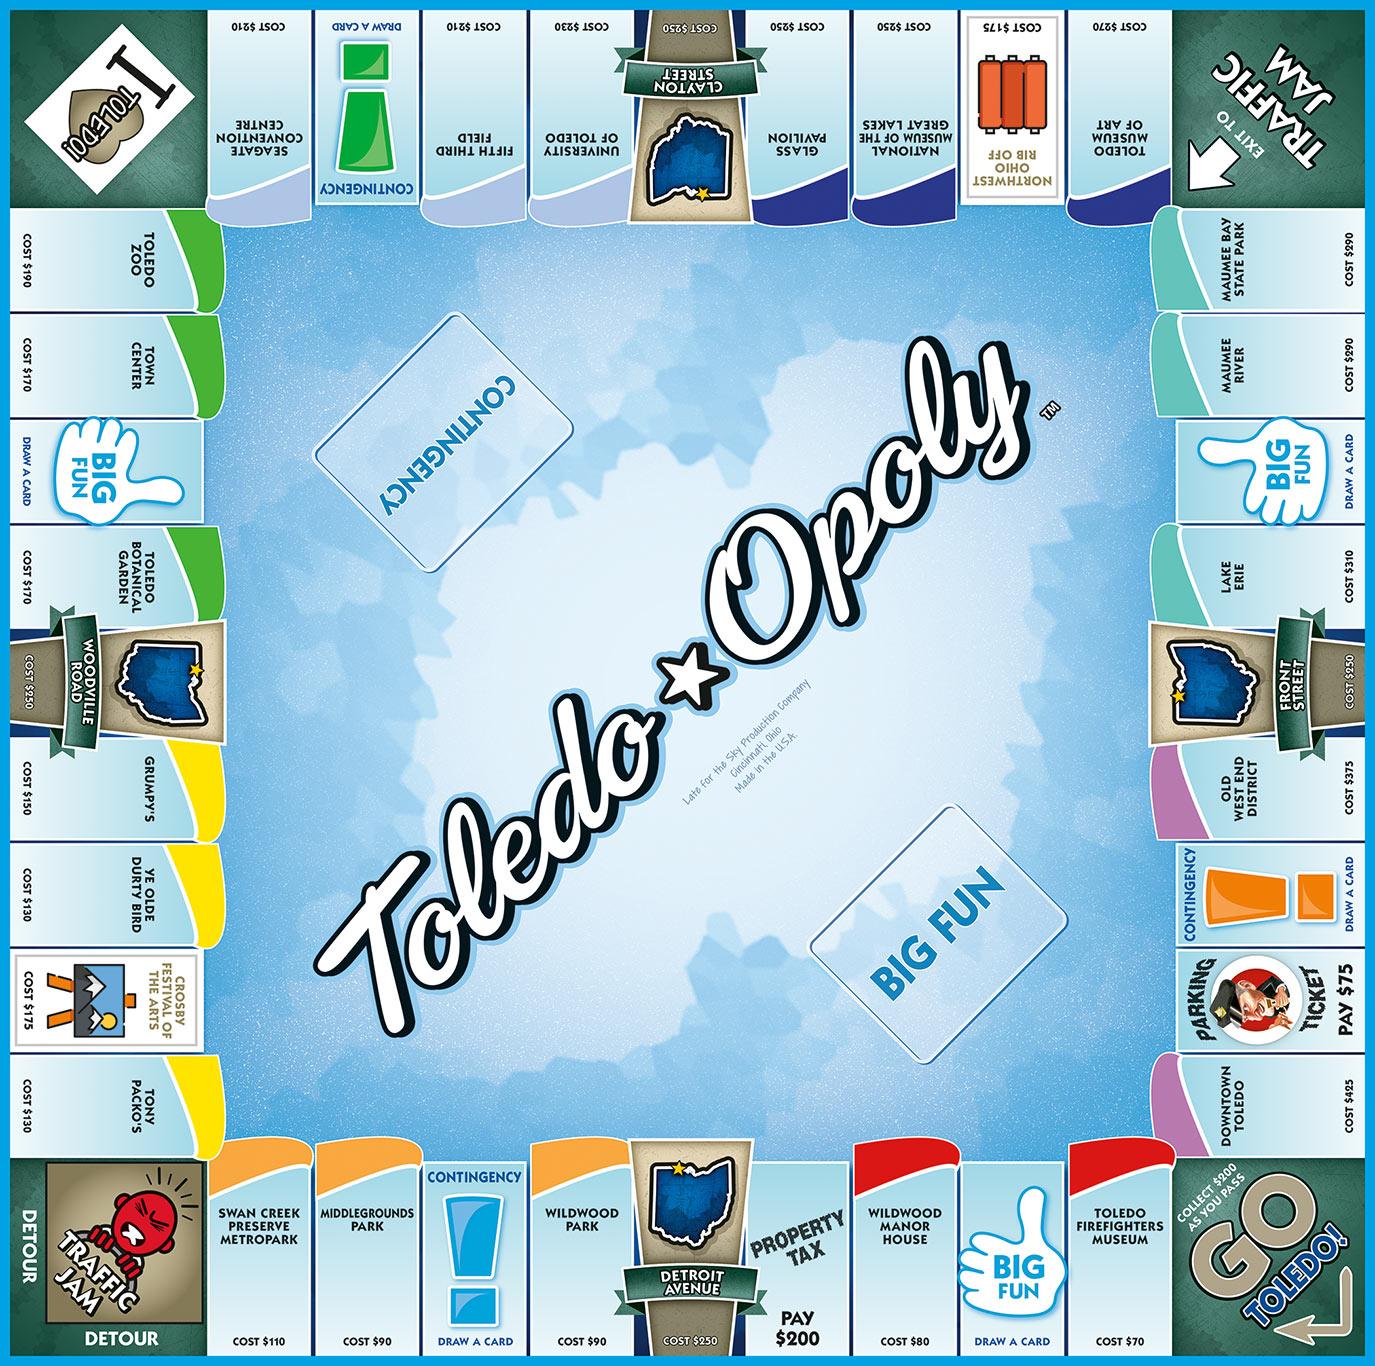 TOLEDO-OPOLY Board Game